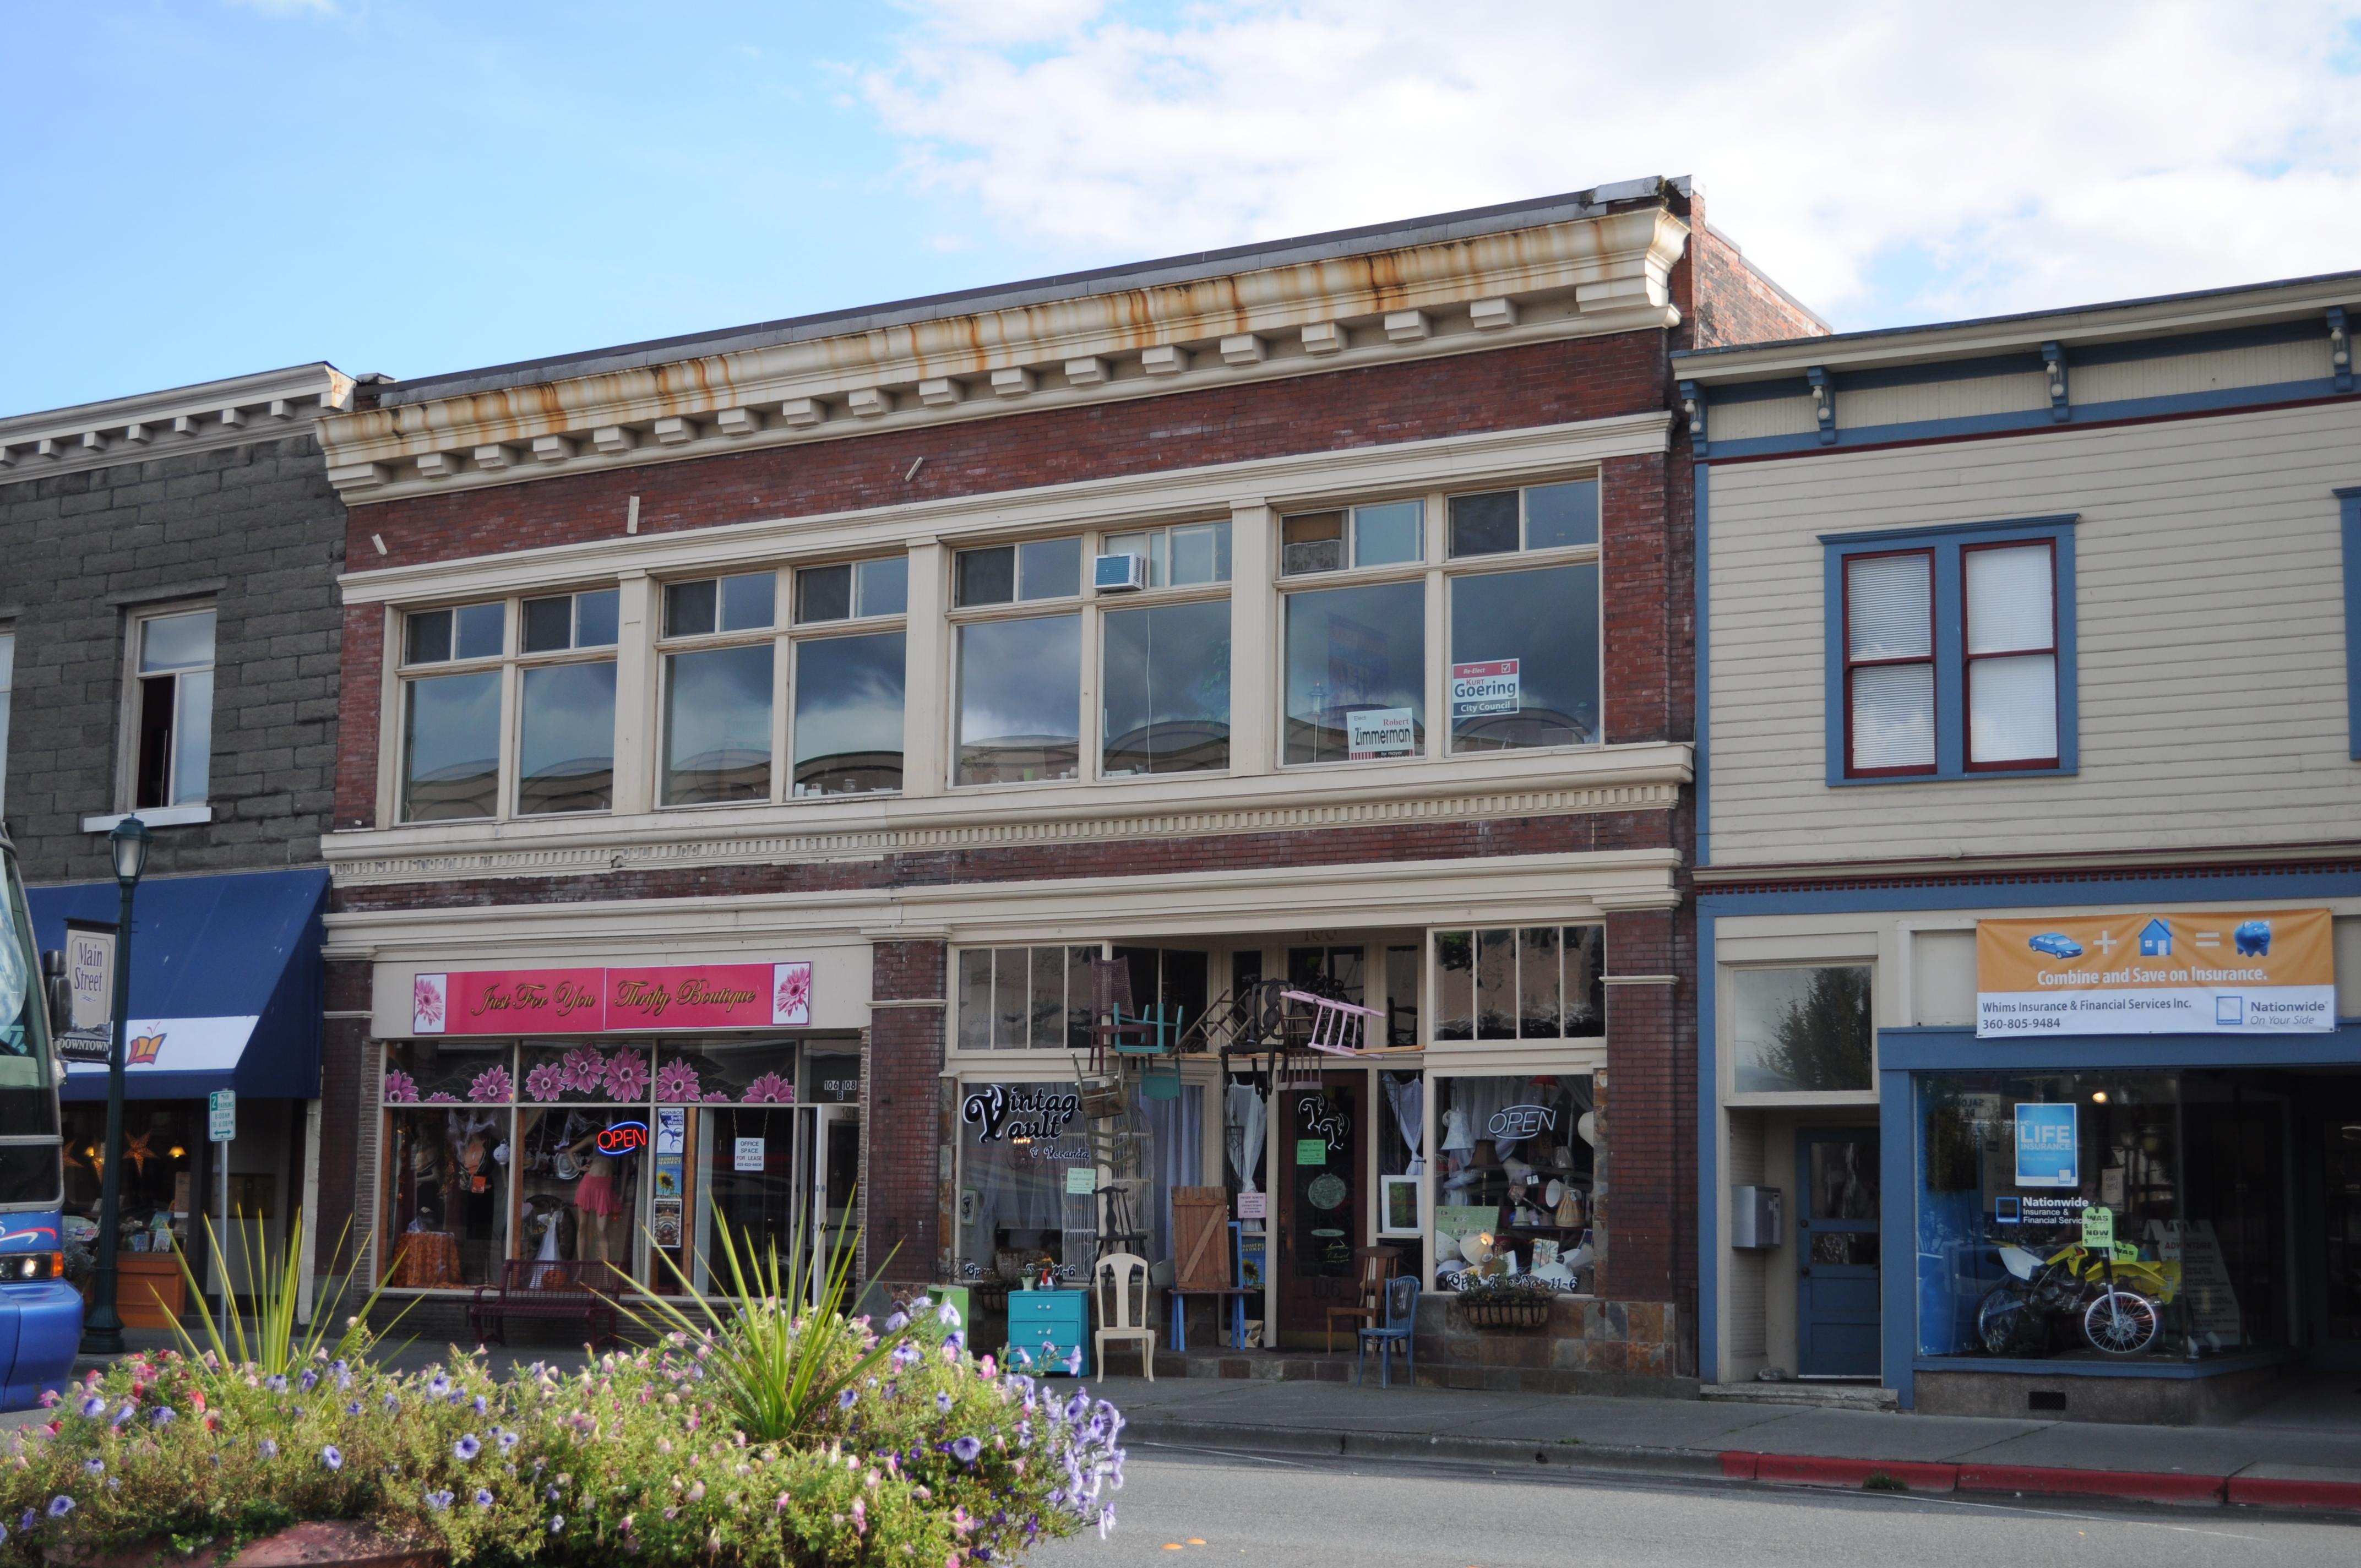 File:Monroe, WA - 106-108 E. Main St.jpg